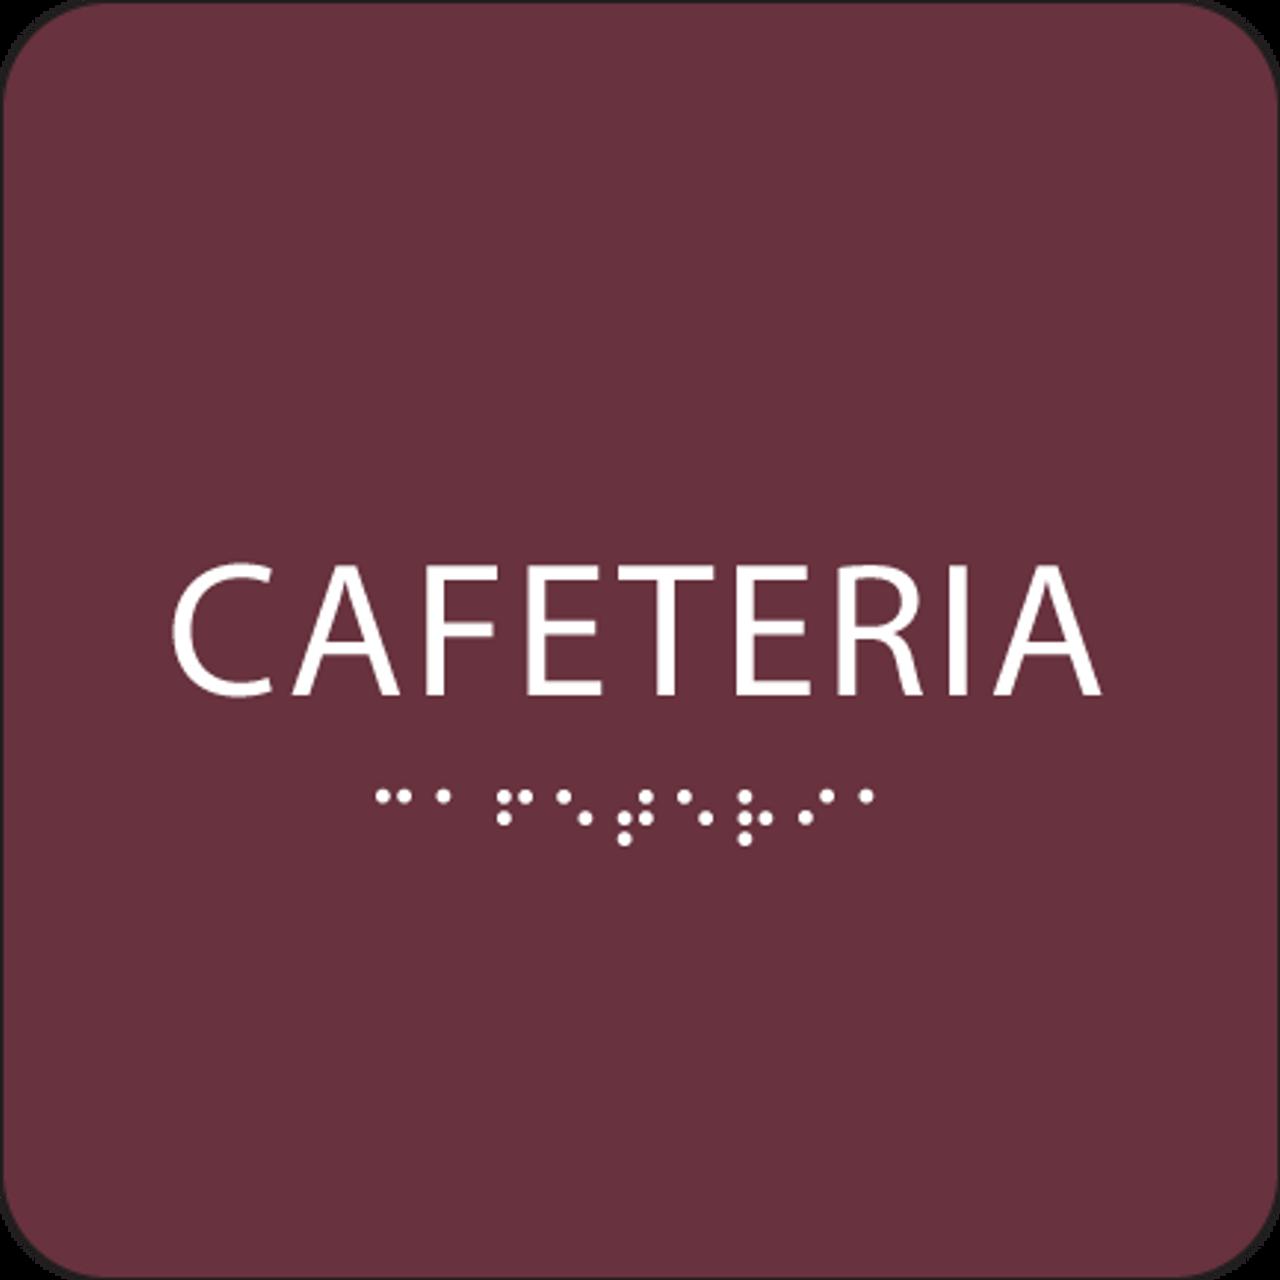 Burgundy Cafeteria ADA Sign